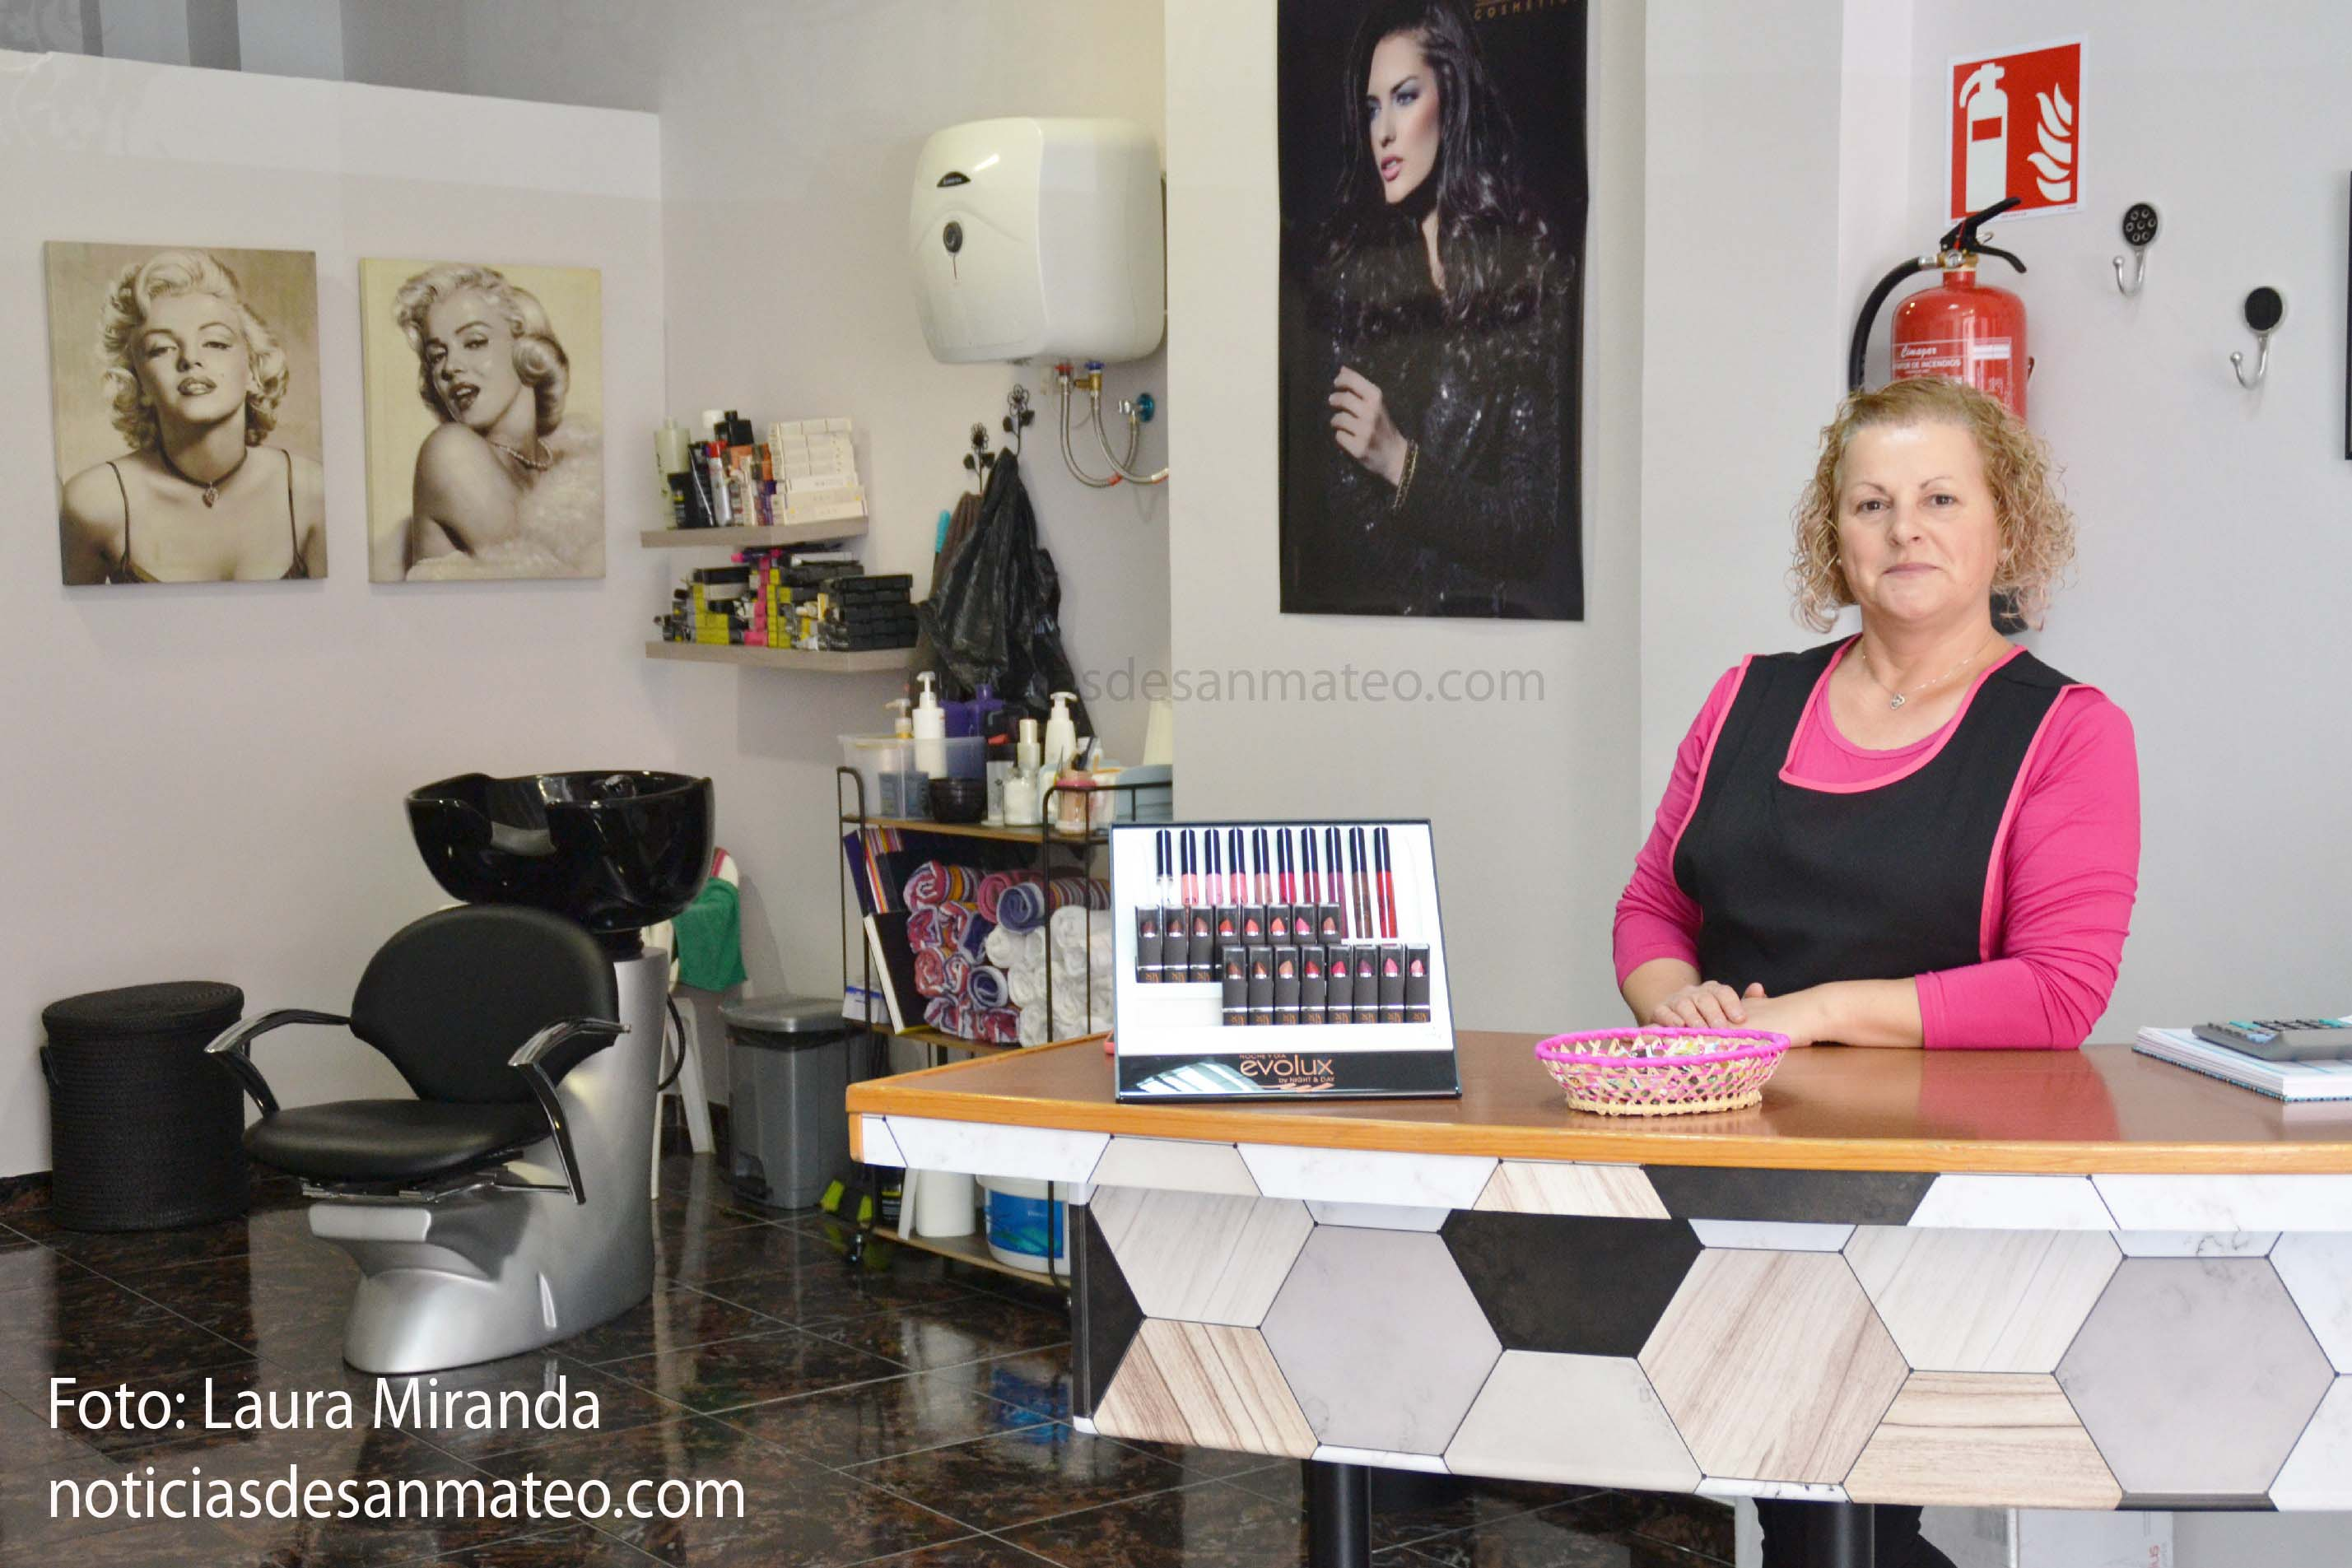 Tony Salon San Mateo Foto Laura Miranda Noticias de San Mateo